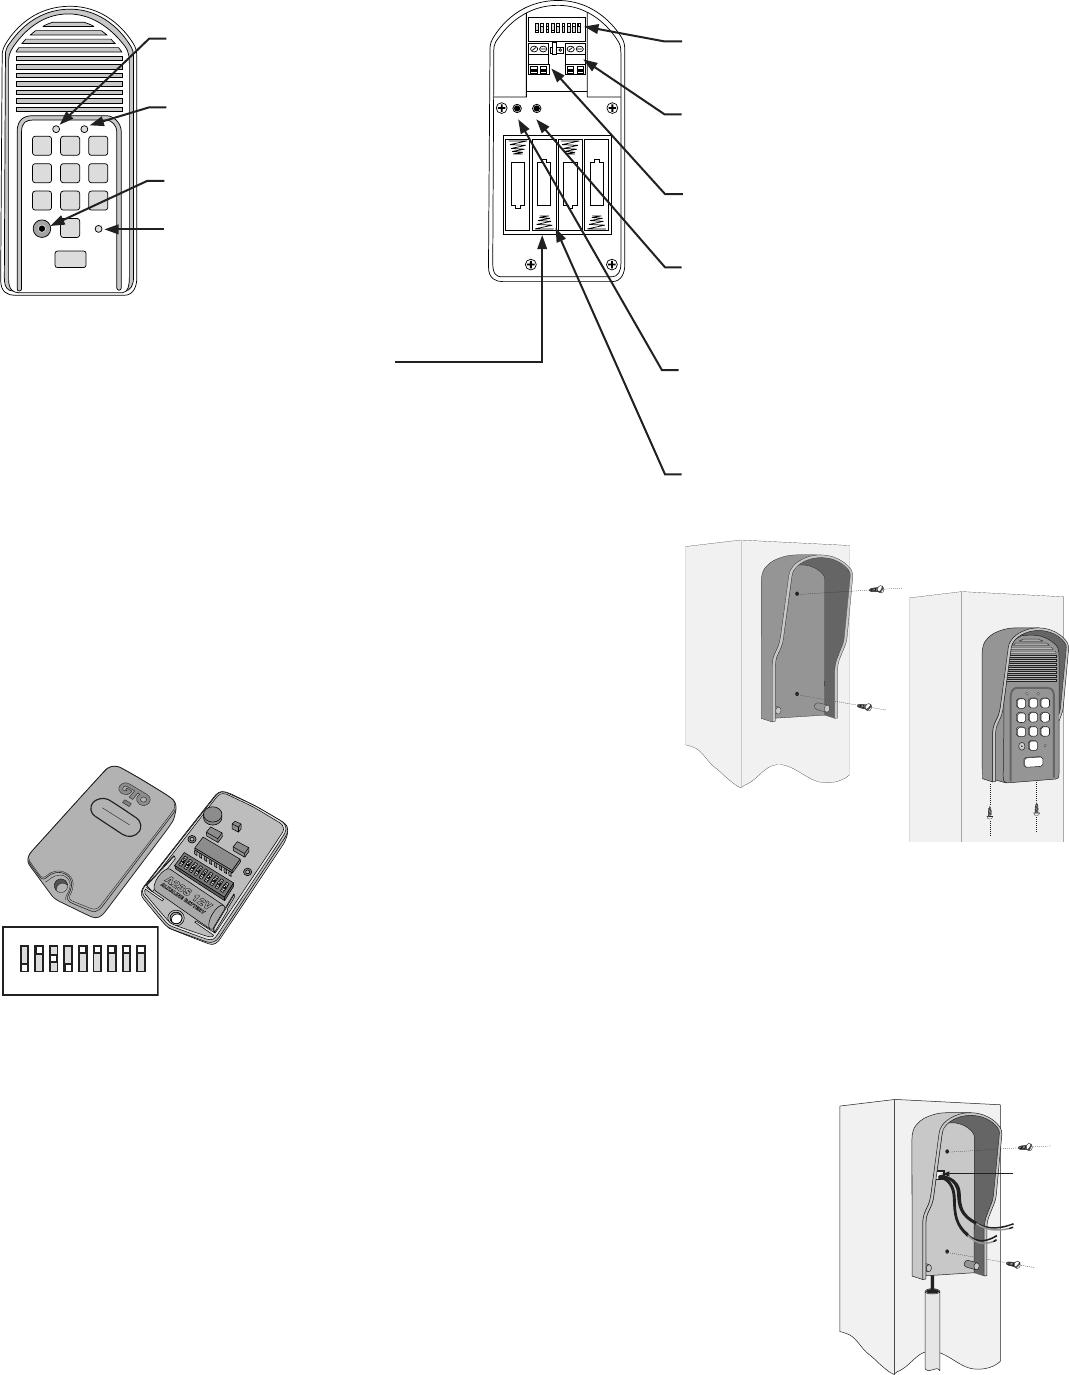 FM136 Installation Manual !! Mighty Mule Wireless Intercom